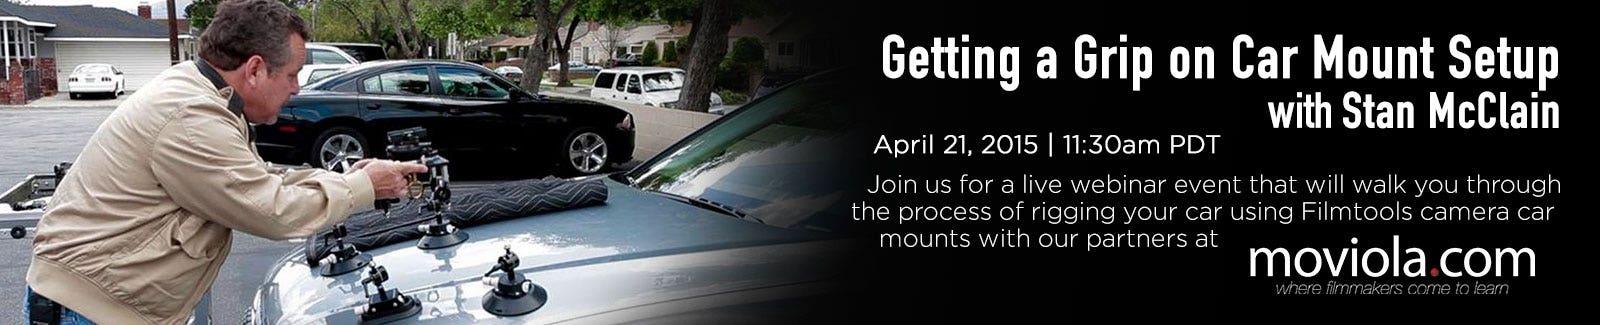 Car Mount Webinar